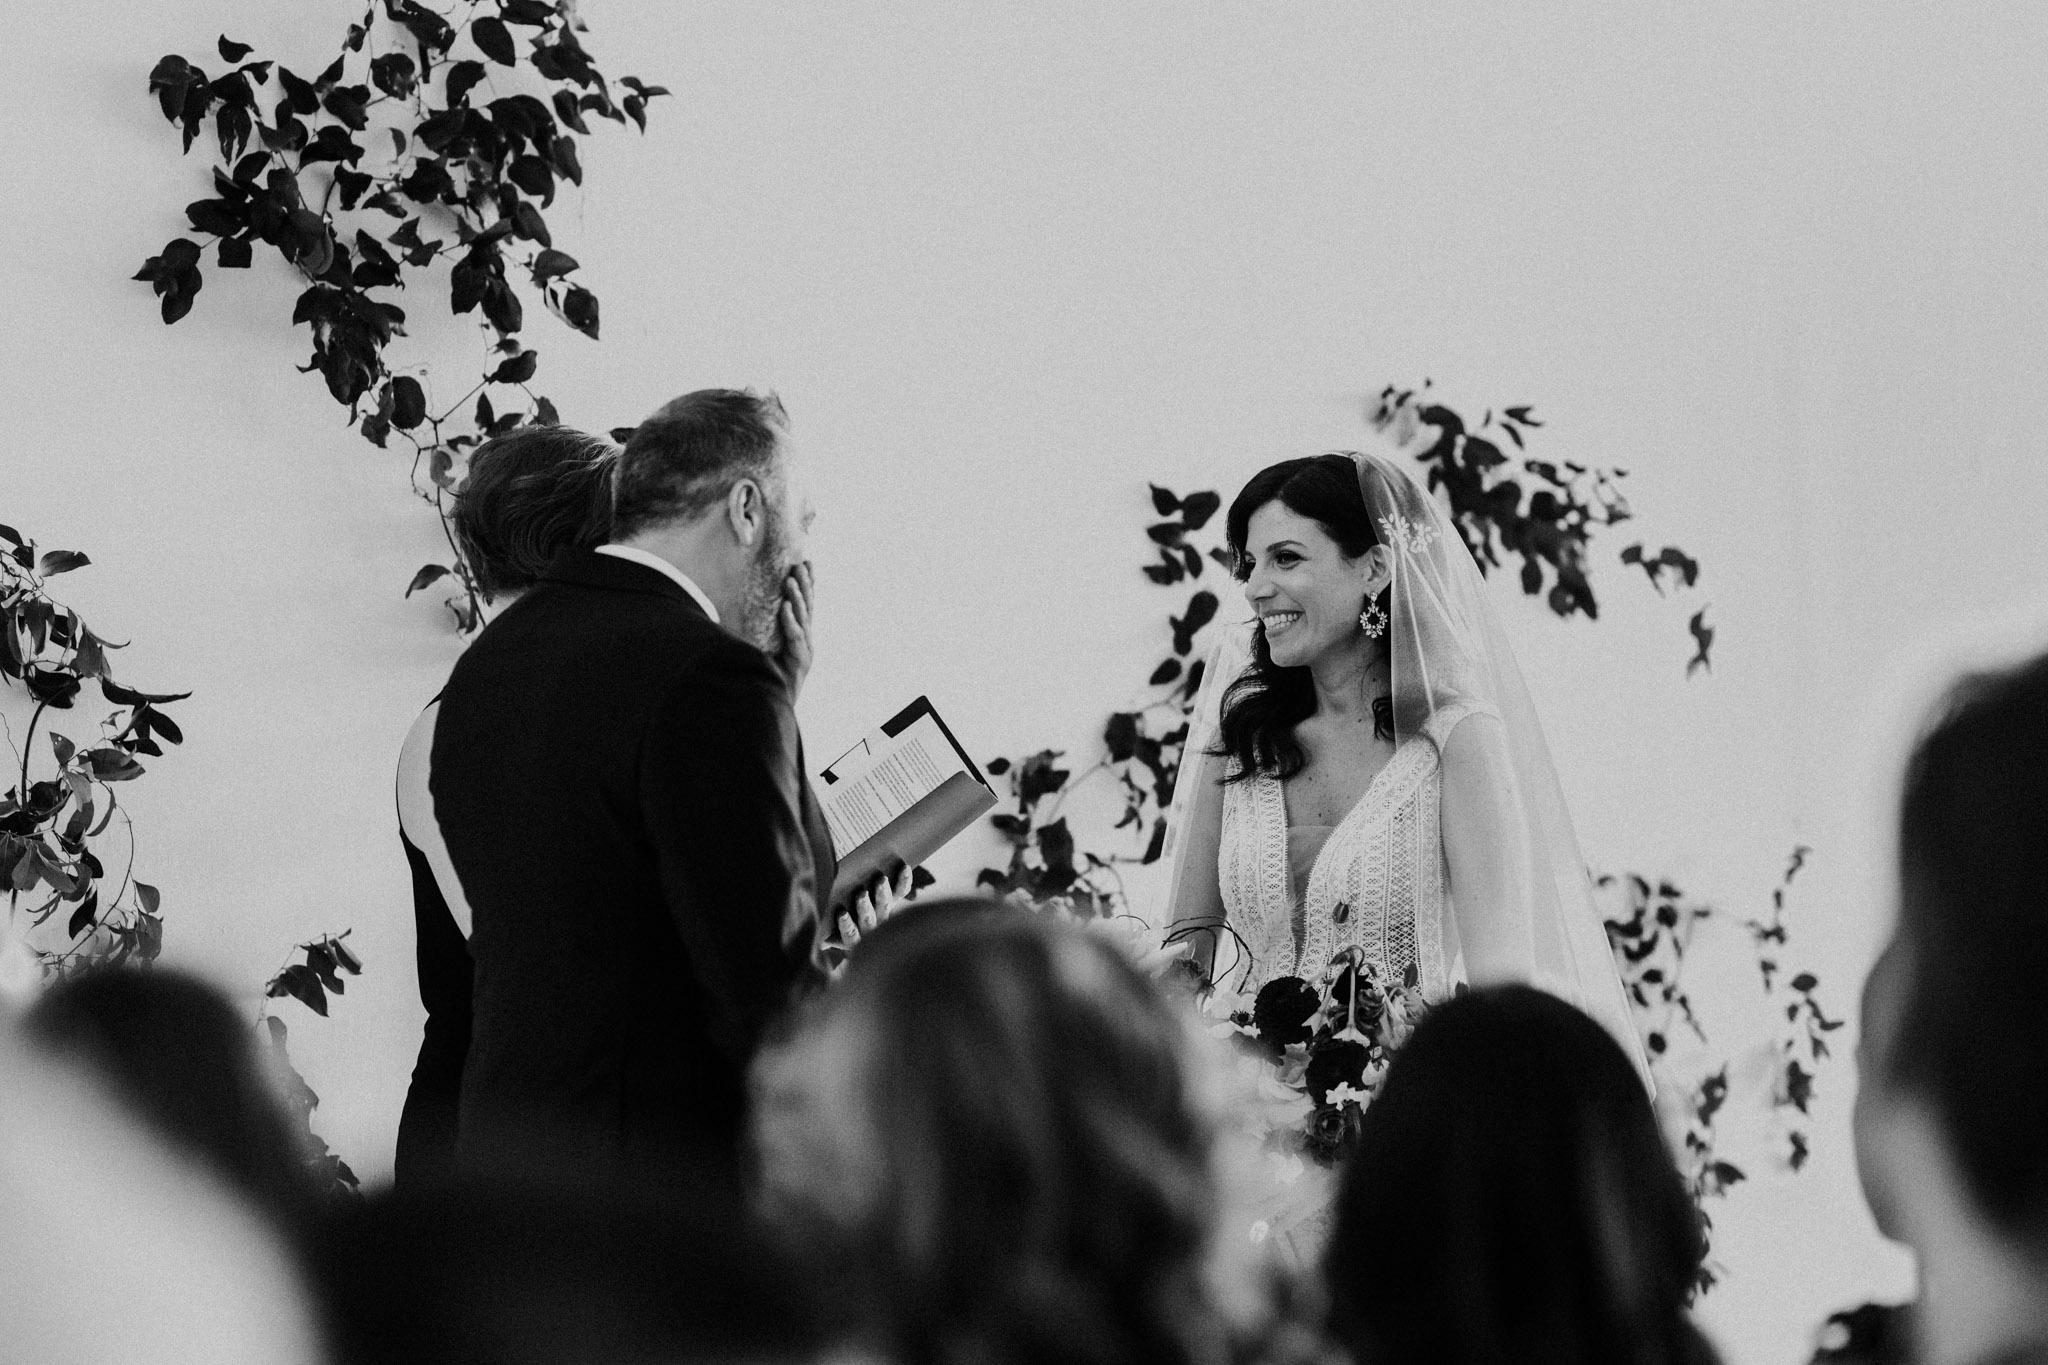 District 28 Wedding Toronto - black and white exchanging vows